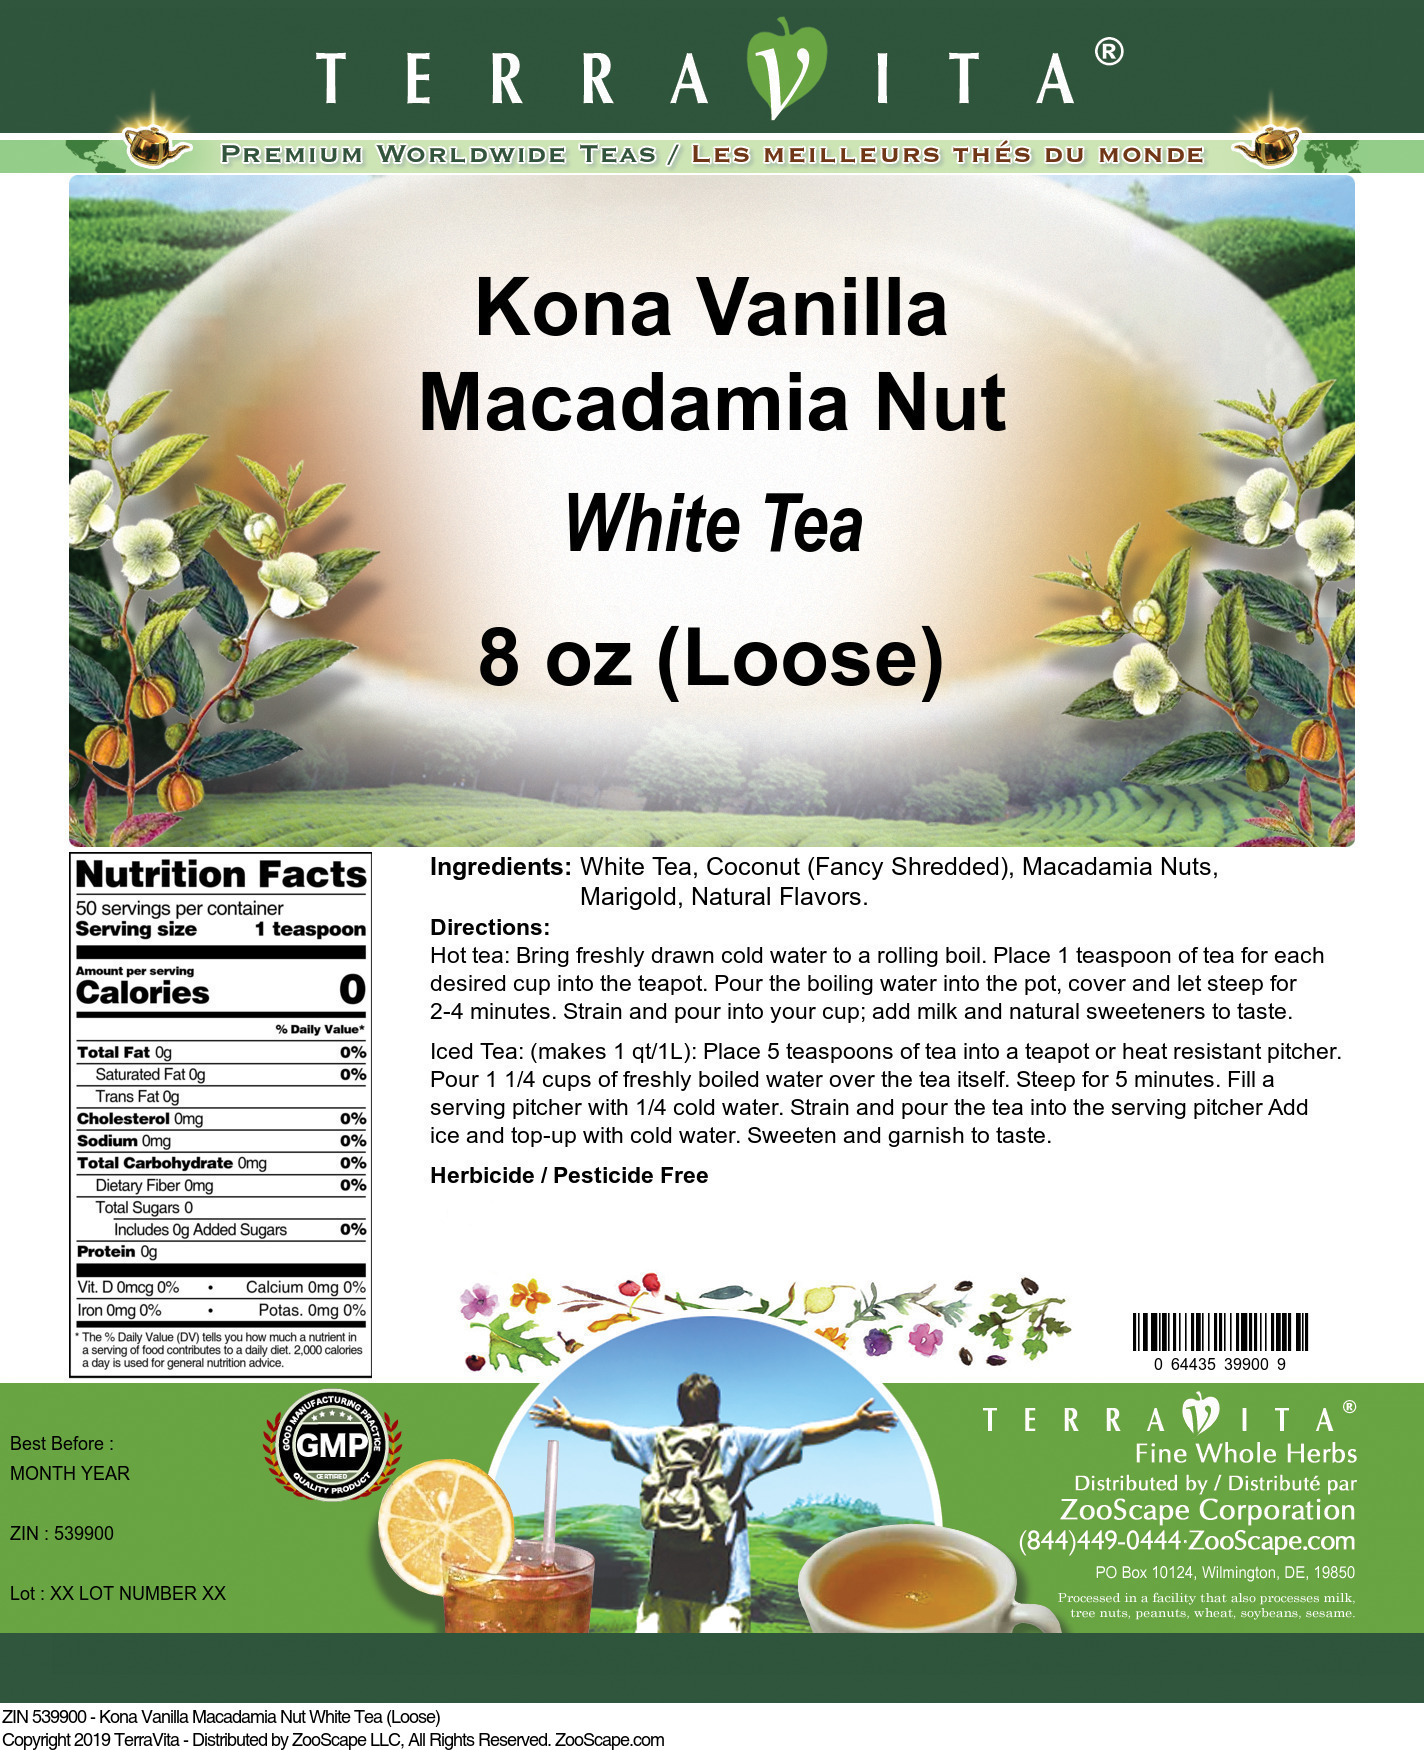 Kona Vanilla Macadamia Nut White Tea (Loose)